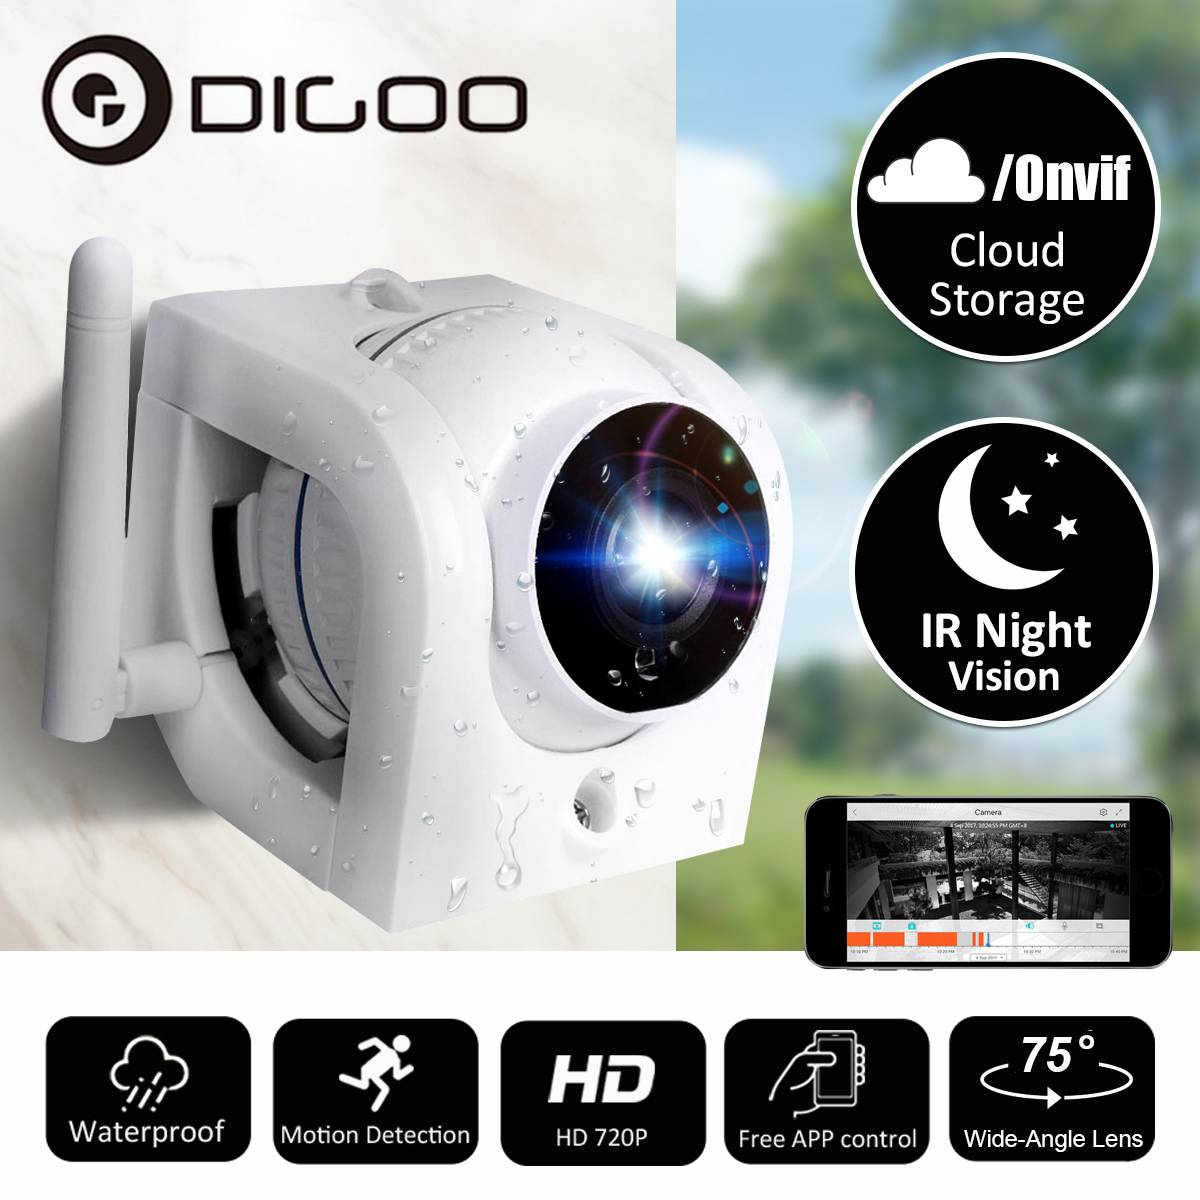 DIGOO DG W02f Cloud Storage Outdoor WIFI Security IP Camera 1080P Video Surveillance Camera Waterproof Motion Detect Onvif|Surveillance Cameras| |  - title=